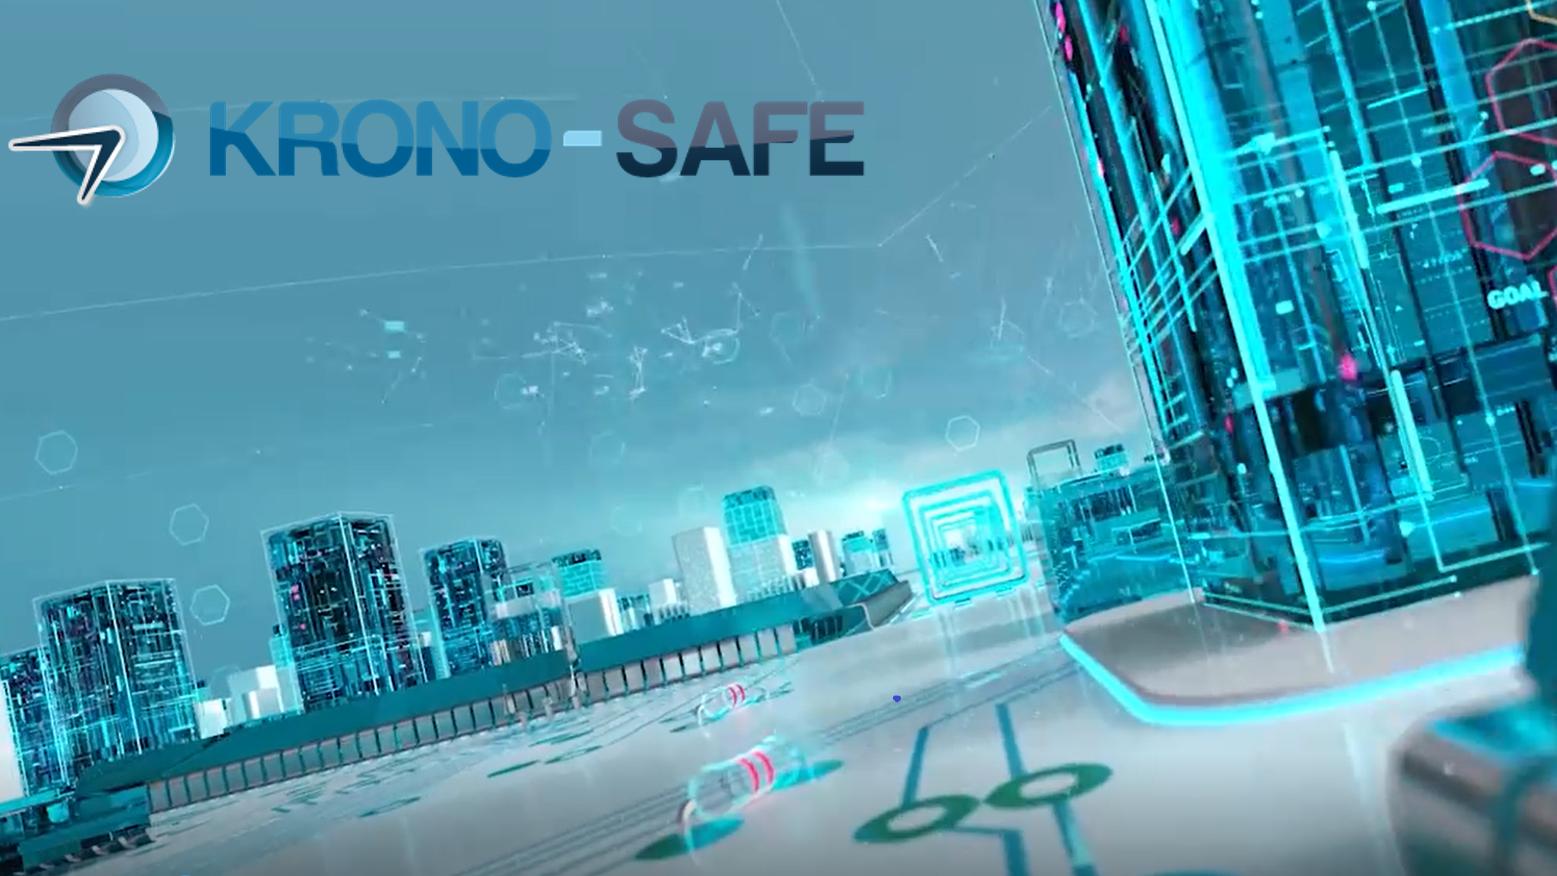 Krono-Safe Thumbnail2